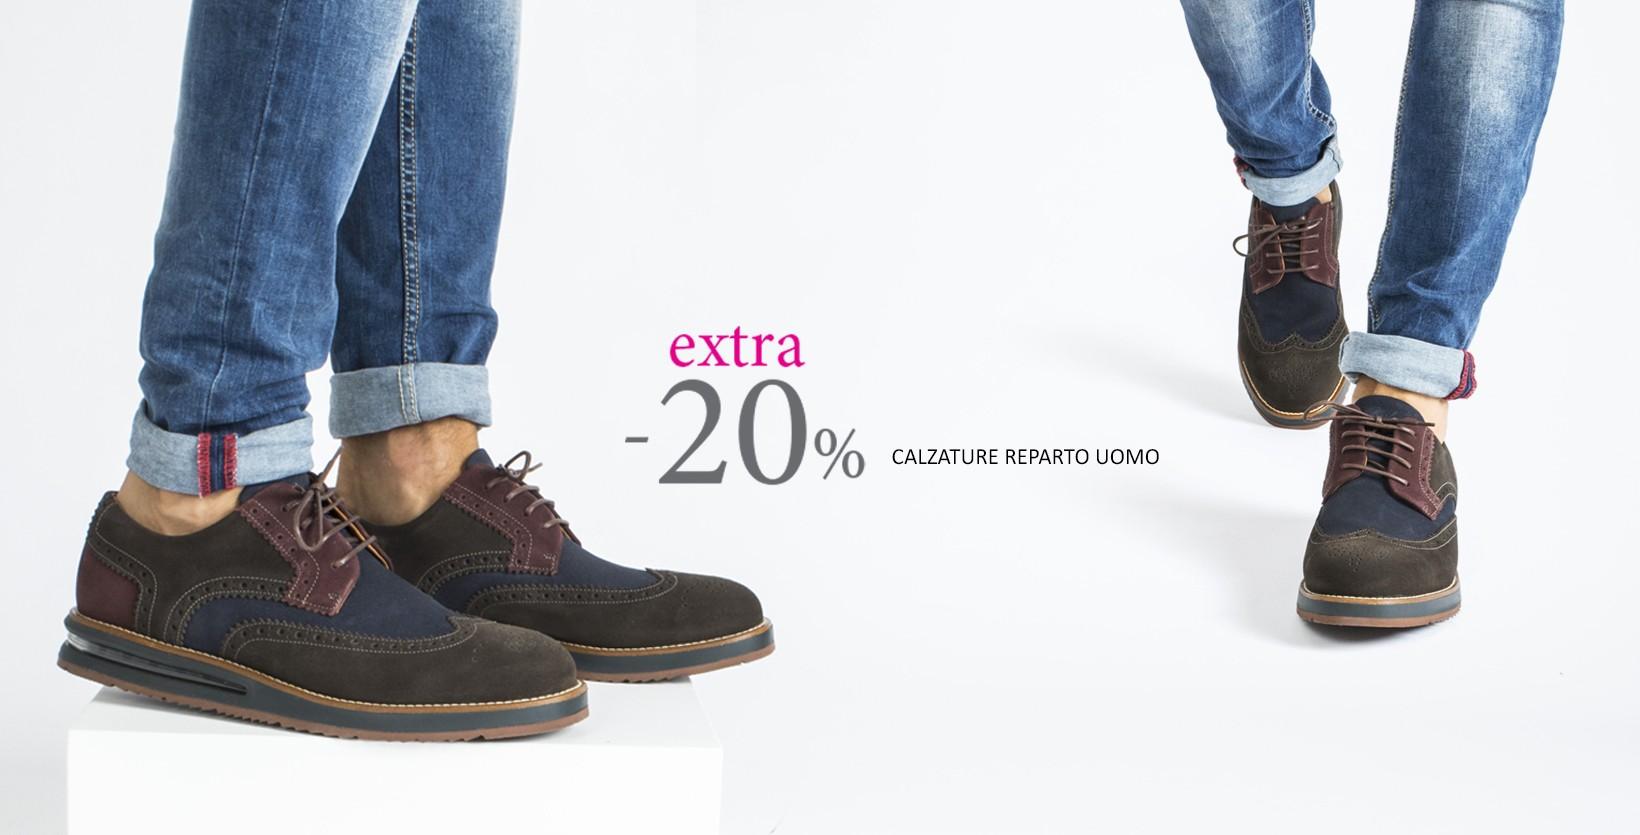 Extra -20% calzature reparto uomo